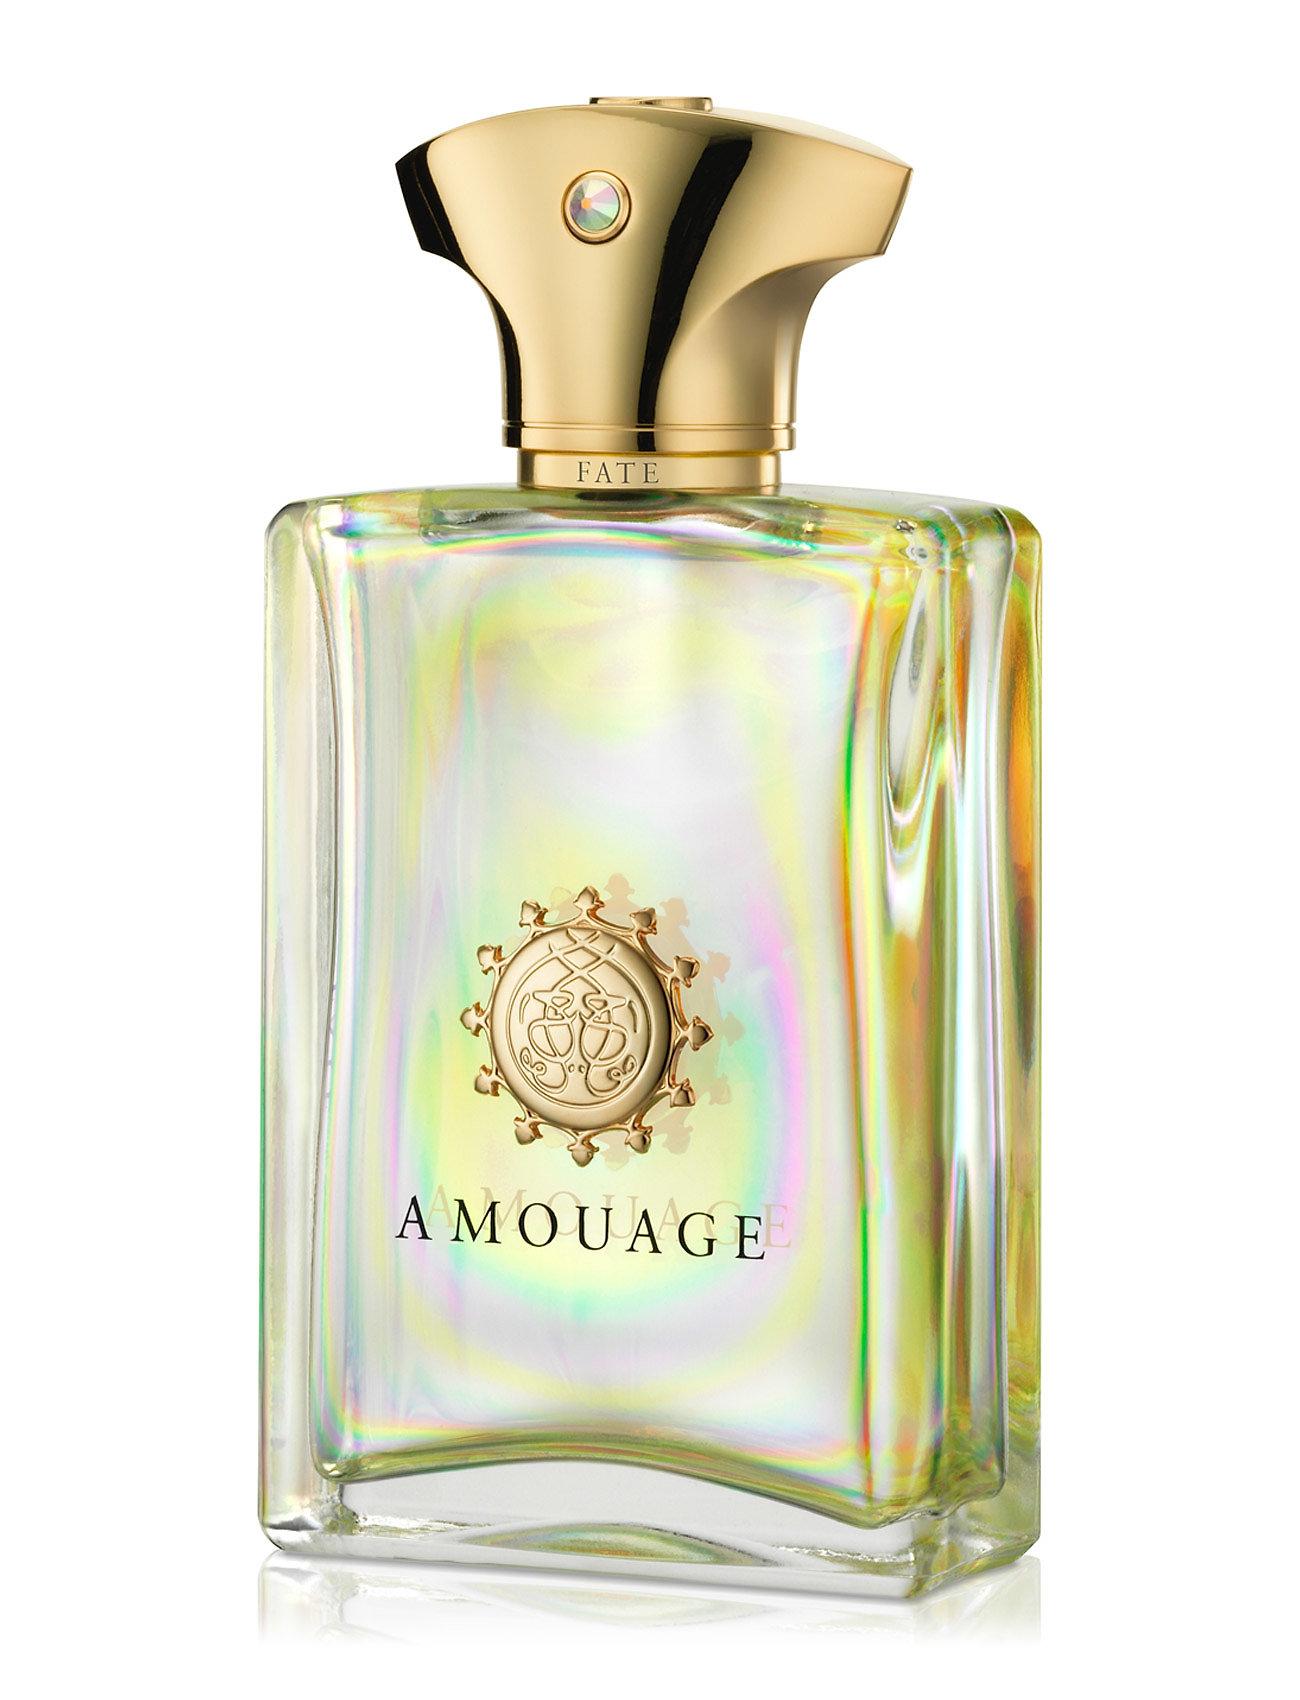 amouage – Fate man fra boozt.com dk